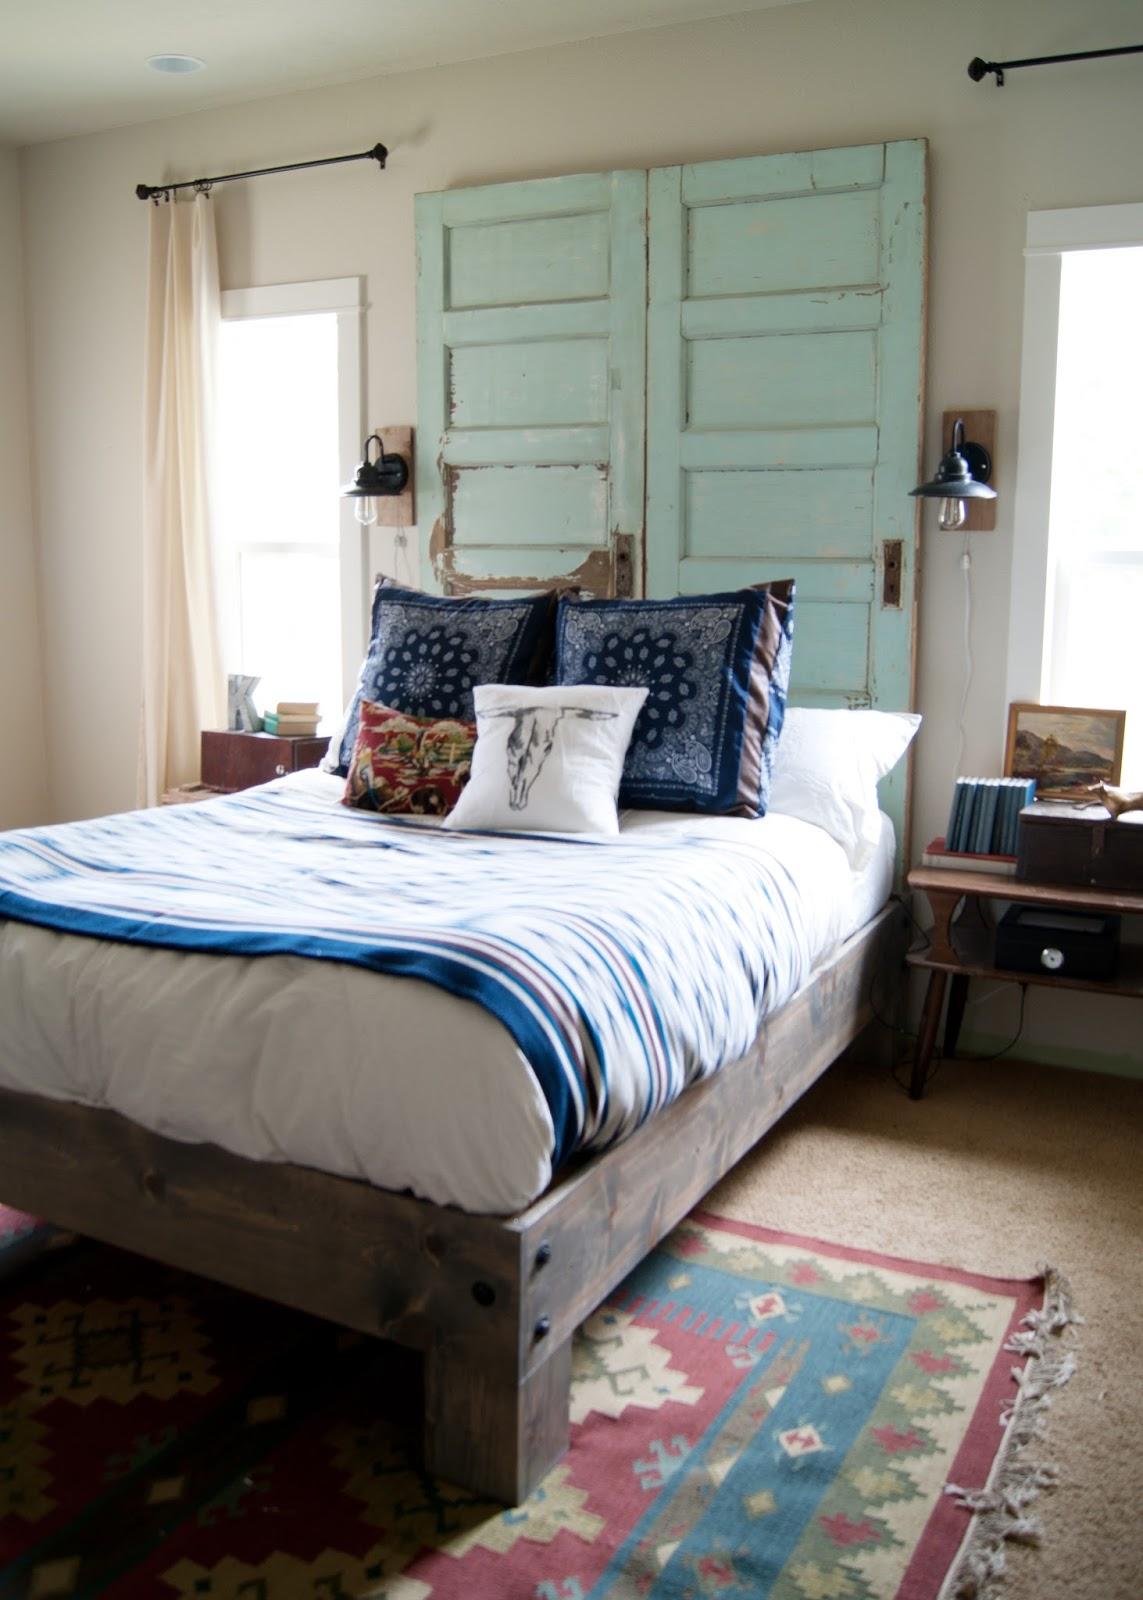 Diy master bedroom makeover - So